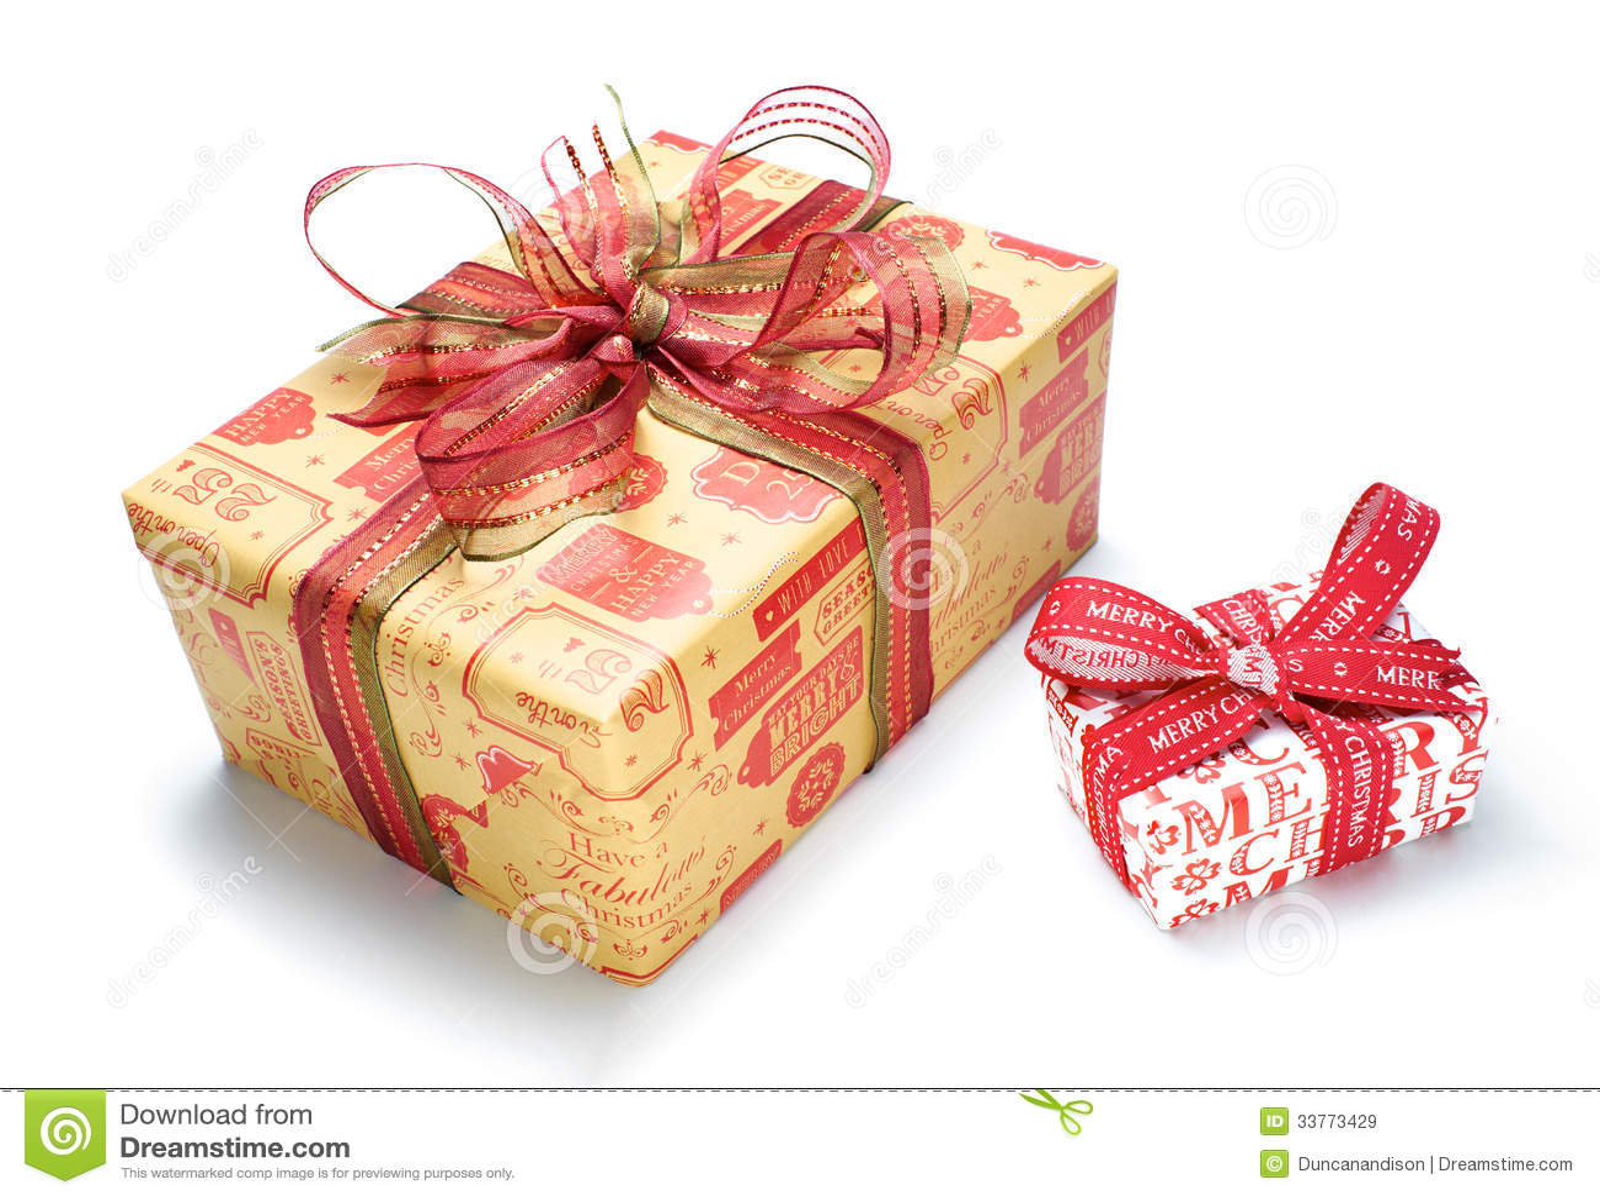 Christmas gifts stock image image of bows coloured 33773429 negle Choice Image